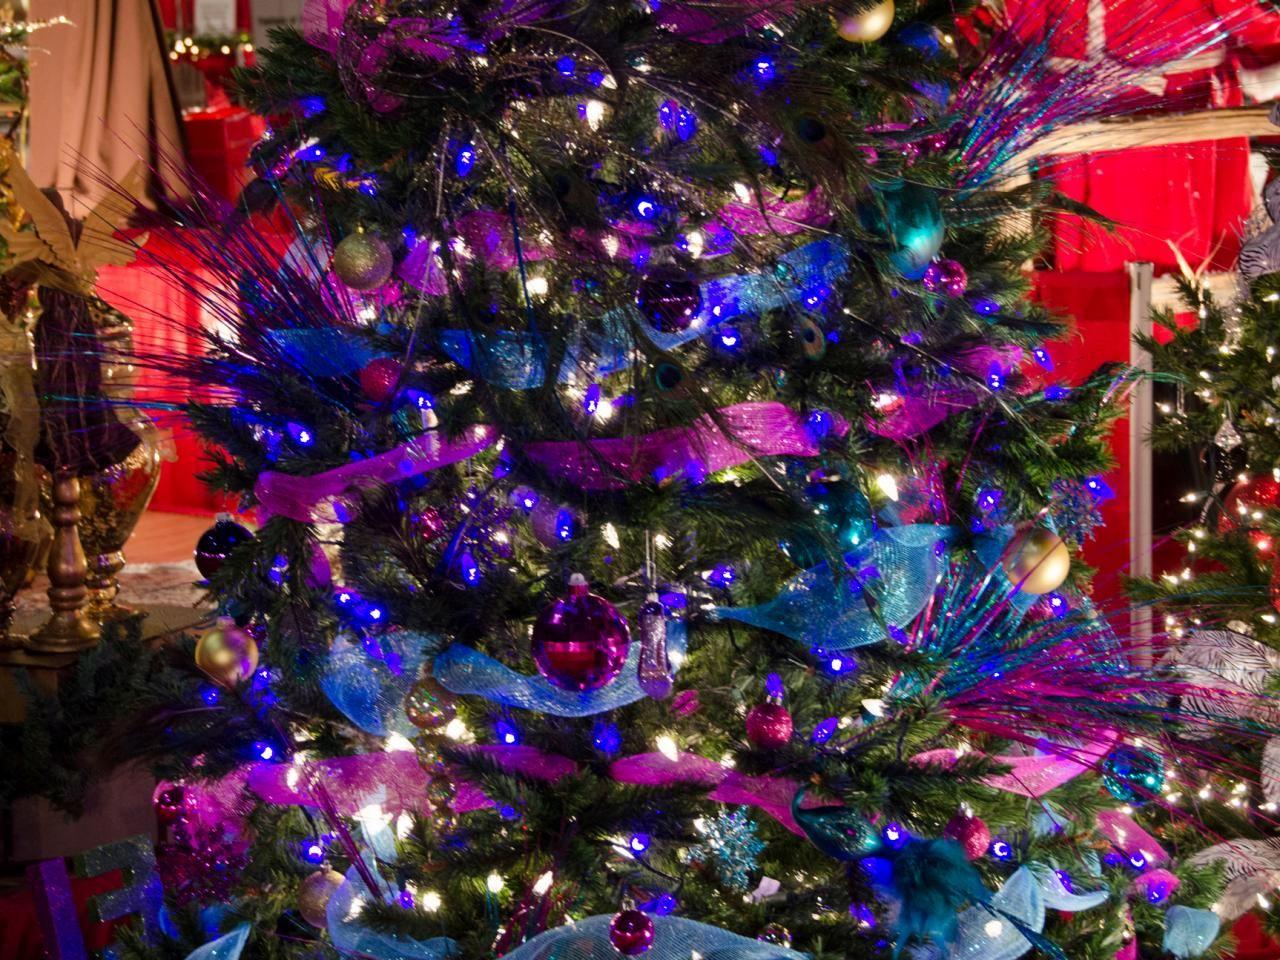 Christmas tree decorations purple - Colorful Christmas Trees